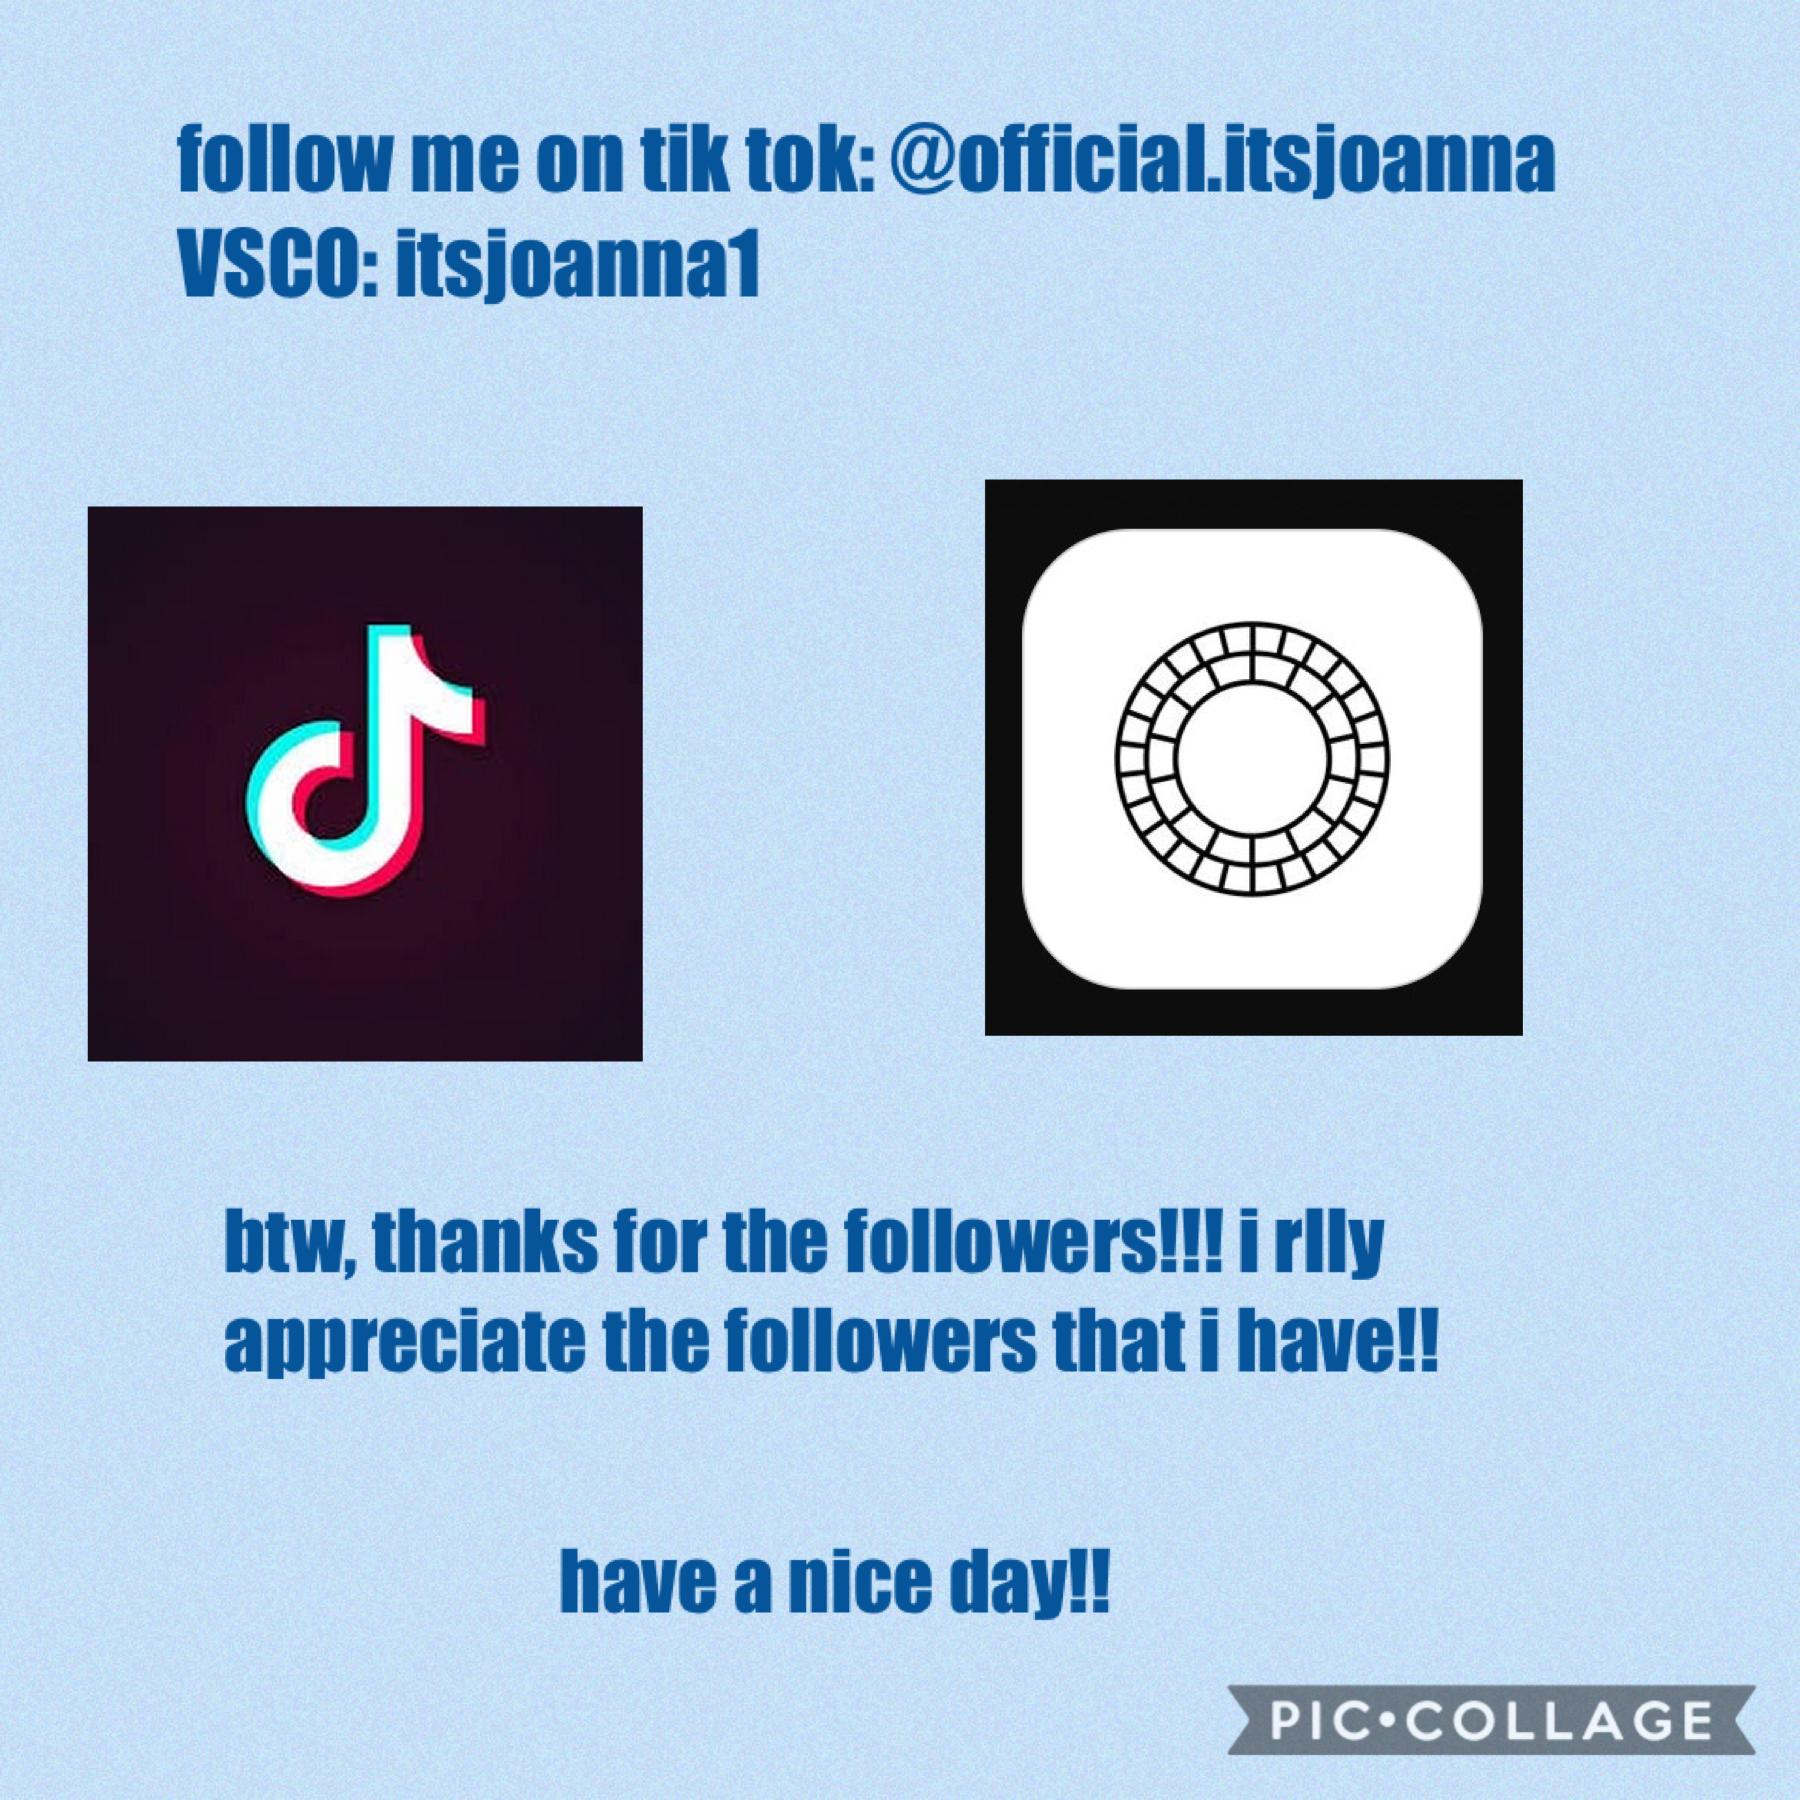 make sure to follow on tik tok and on VSCO!